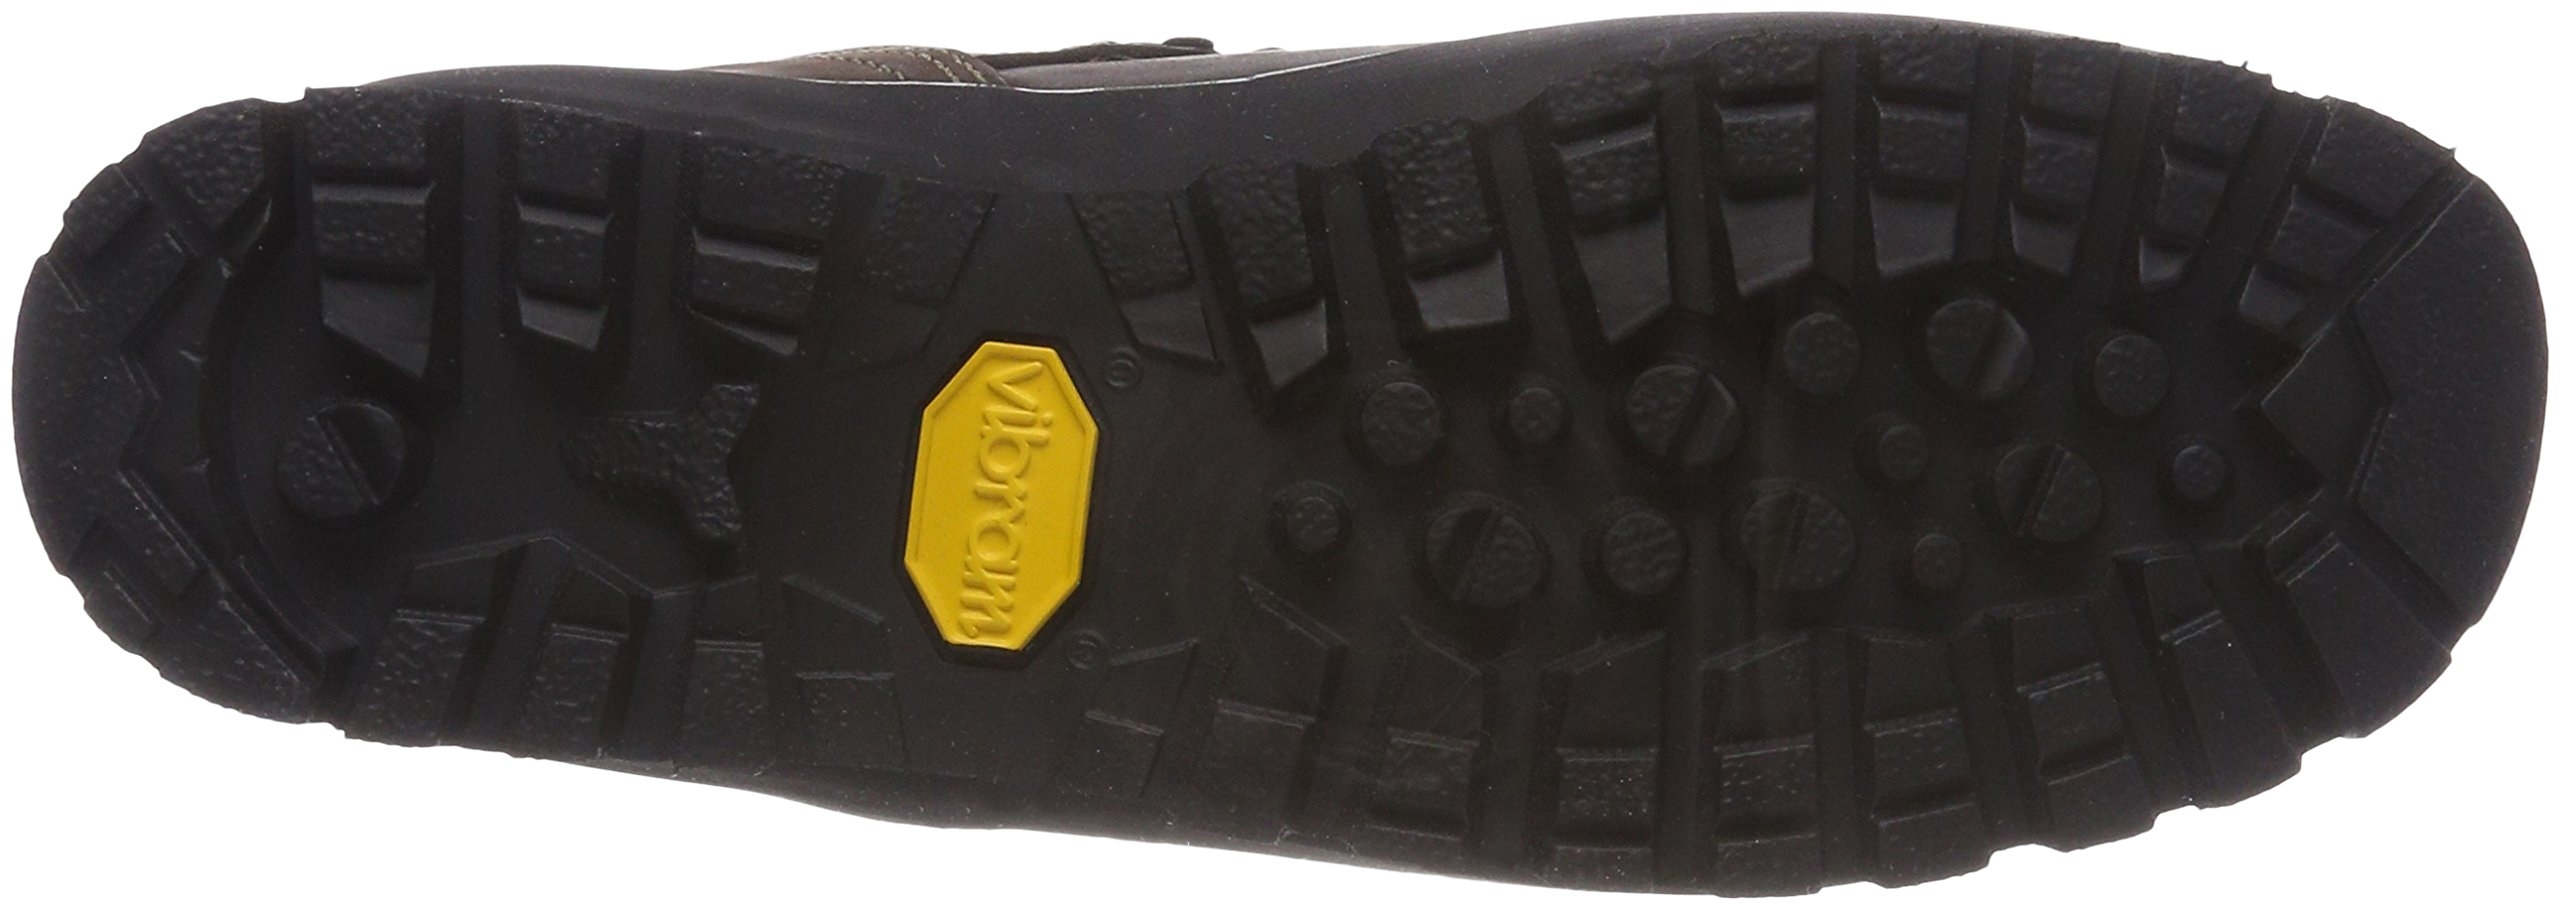 714eGJWWriL - Meindl Women's Borneo Lady 2 MFS (XL) High Rise Hiking Shoes